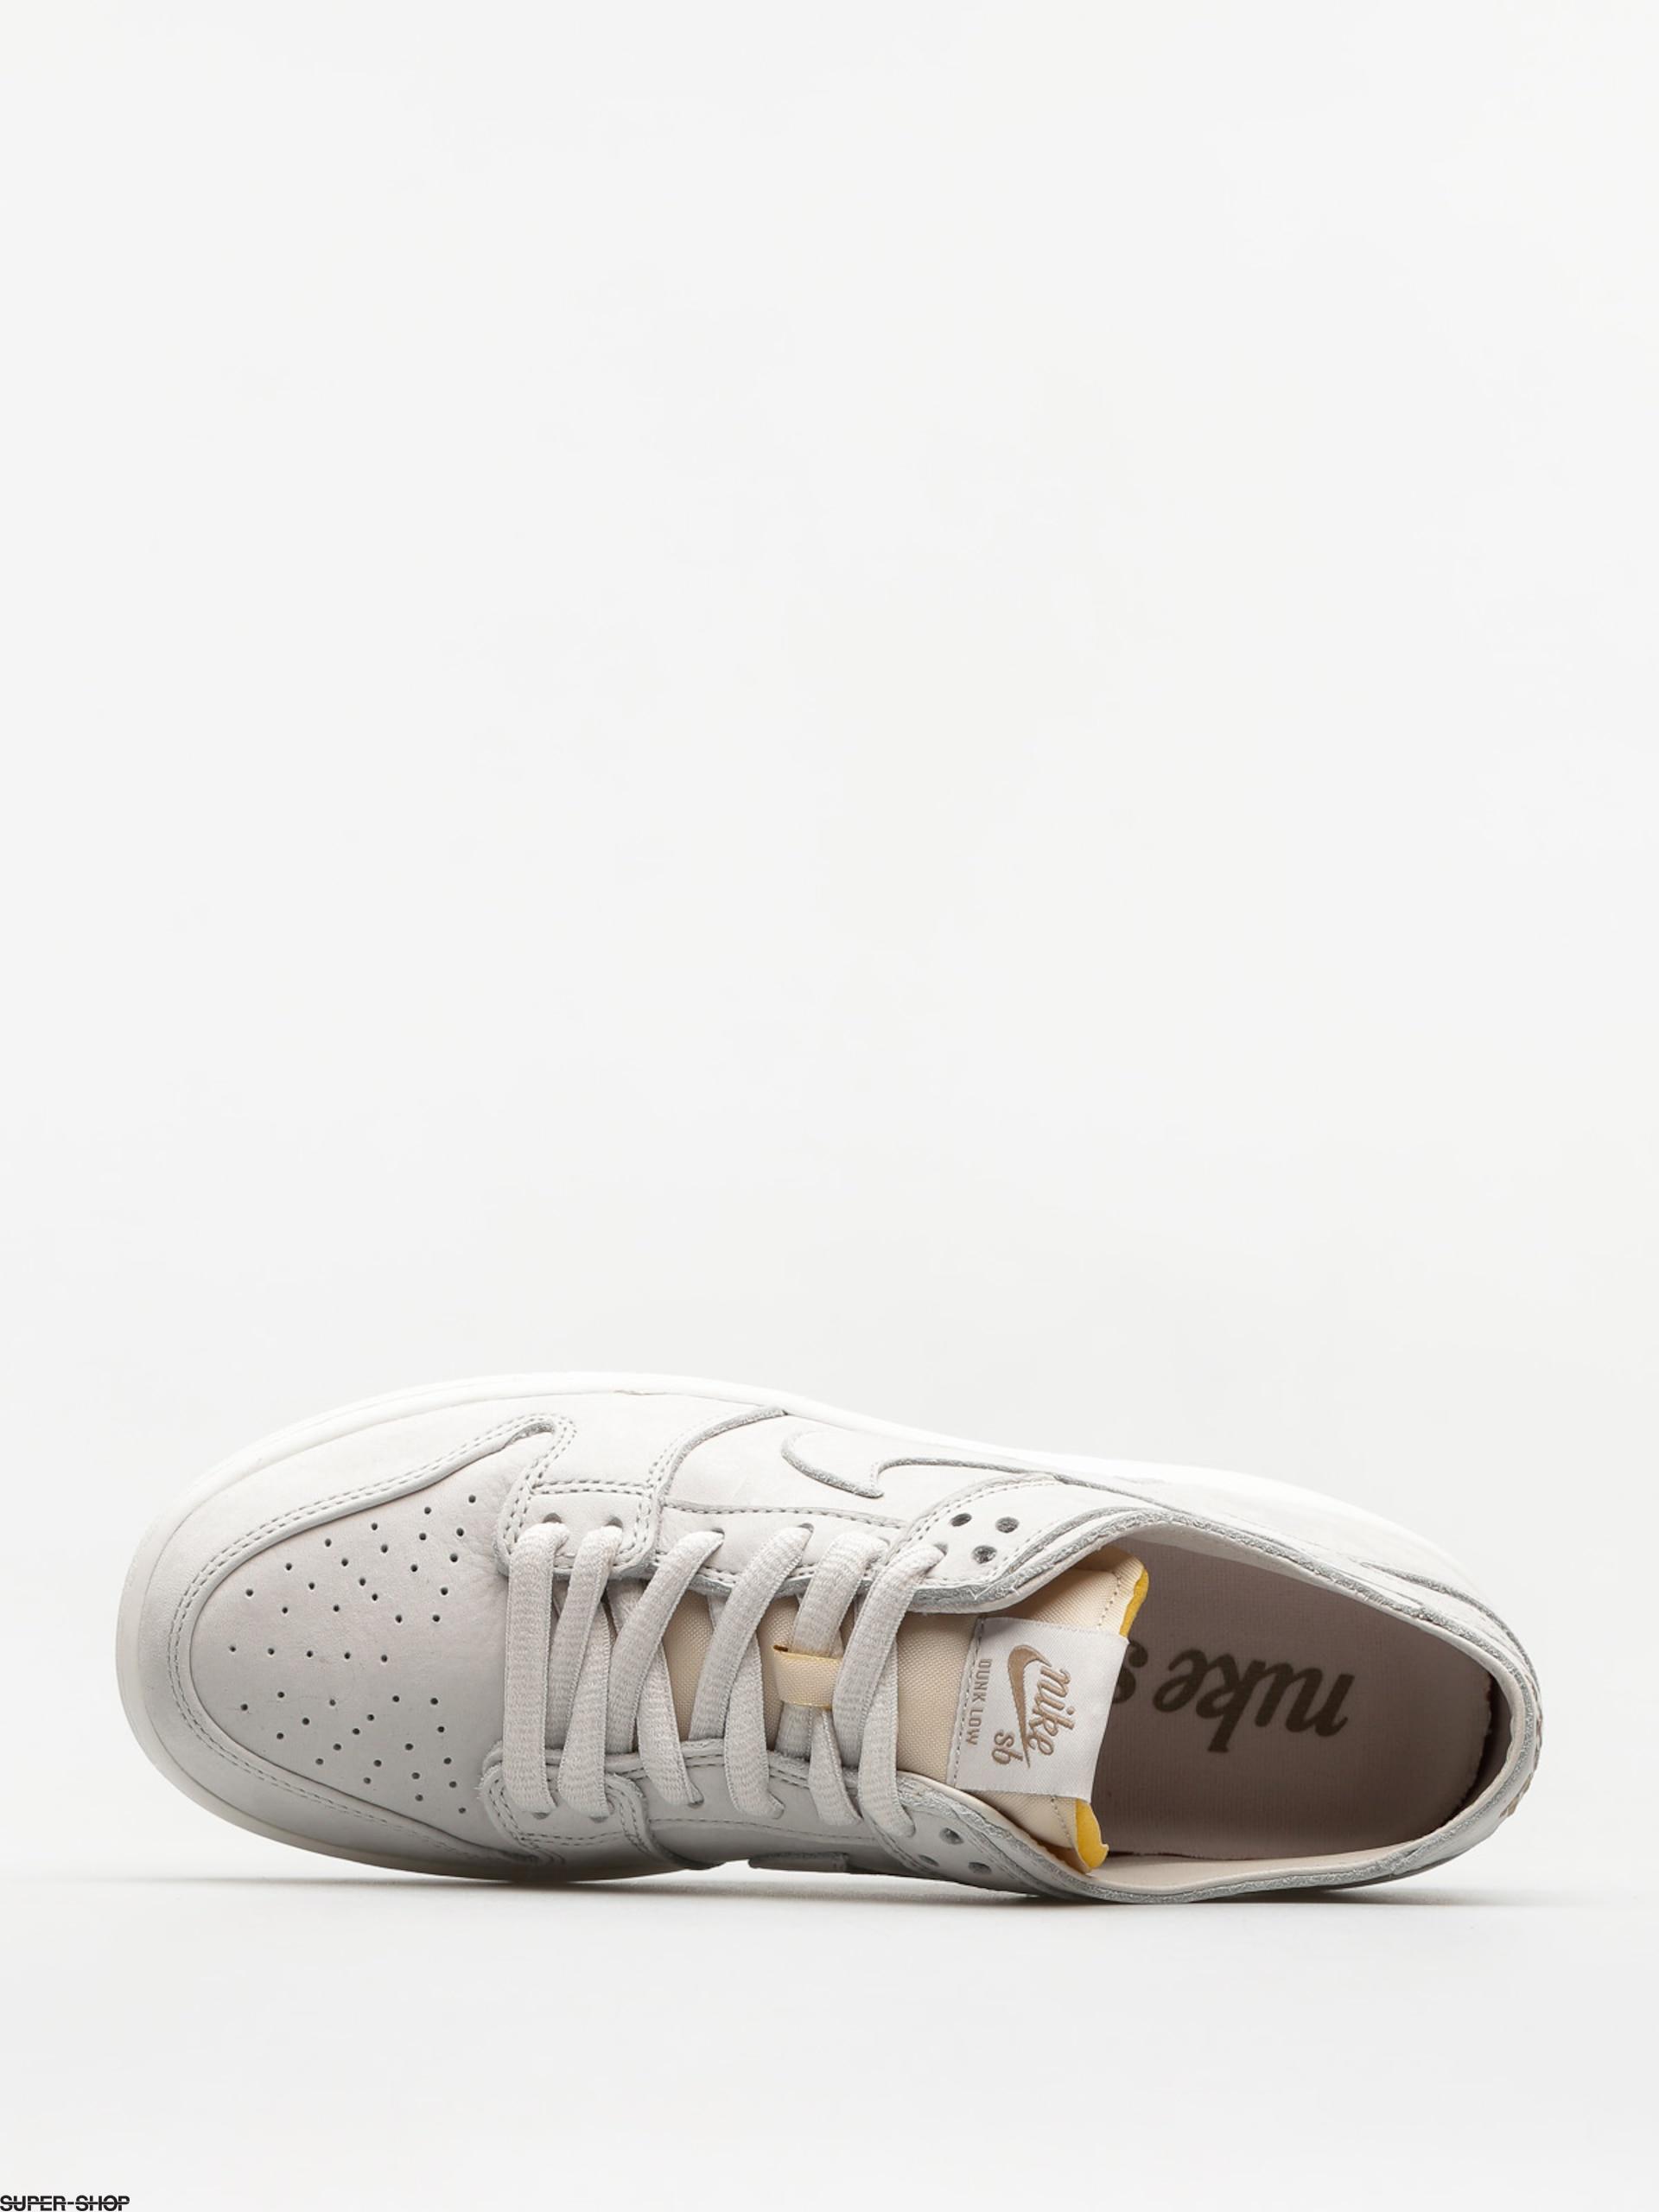 online store 8e372 25bdd Nike SB Shoes Zoom Dunk Low Pro Deconstructed (light bone light bone summit  white khaki)